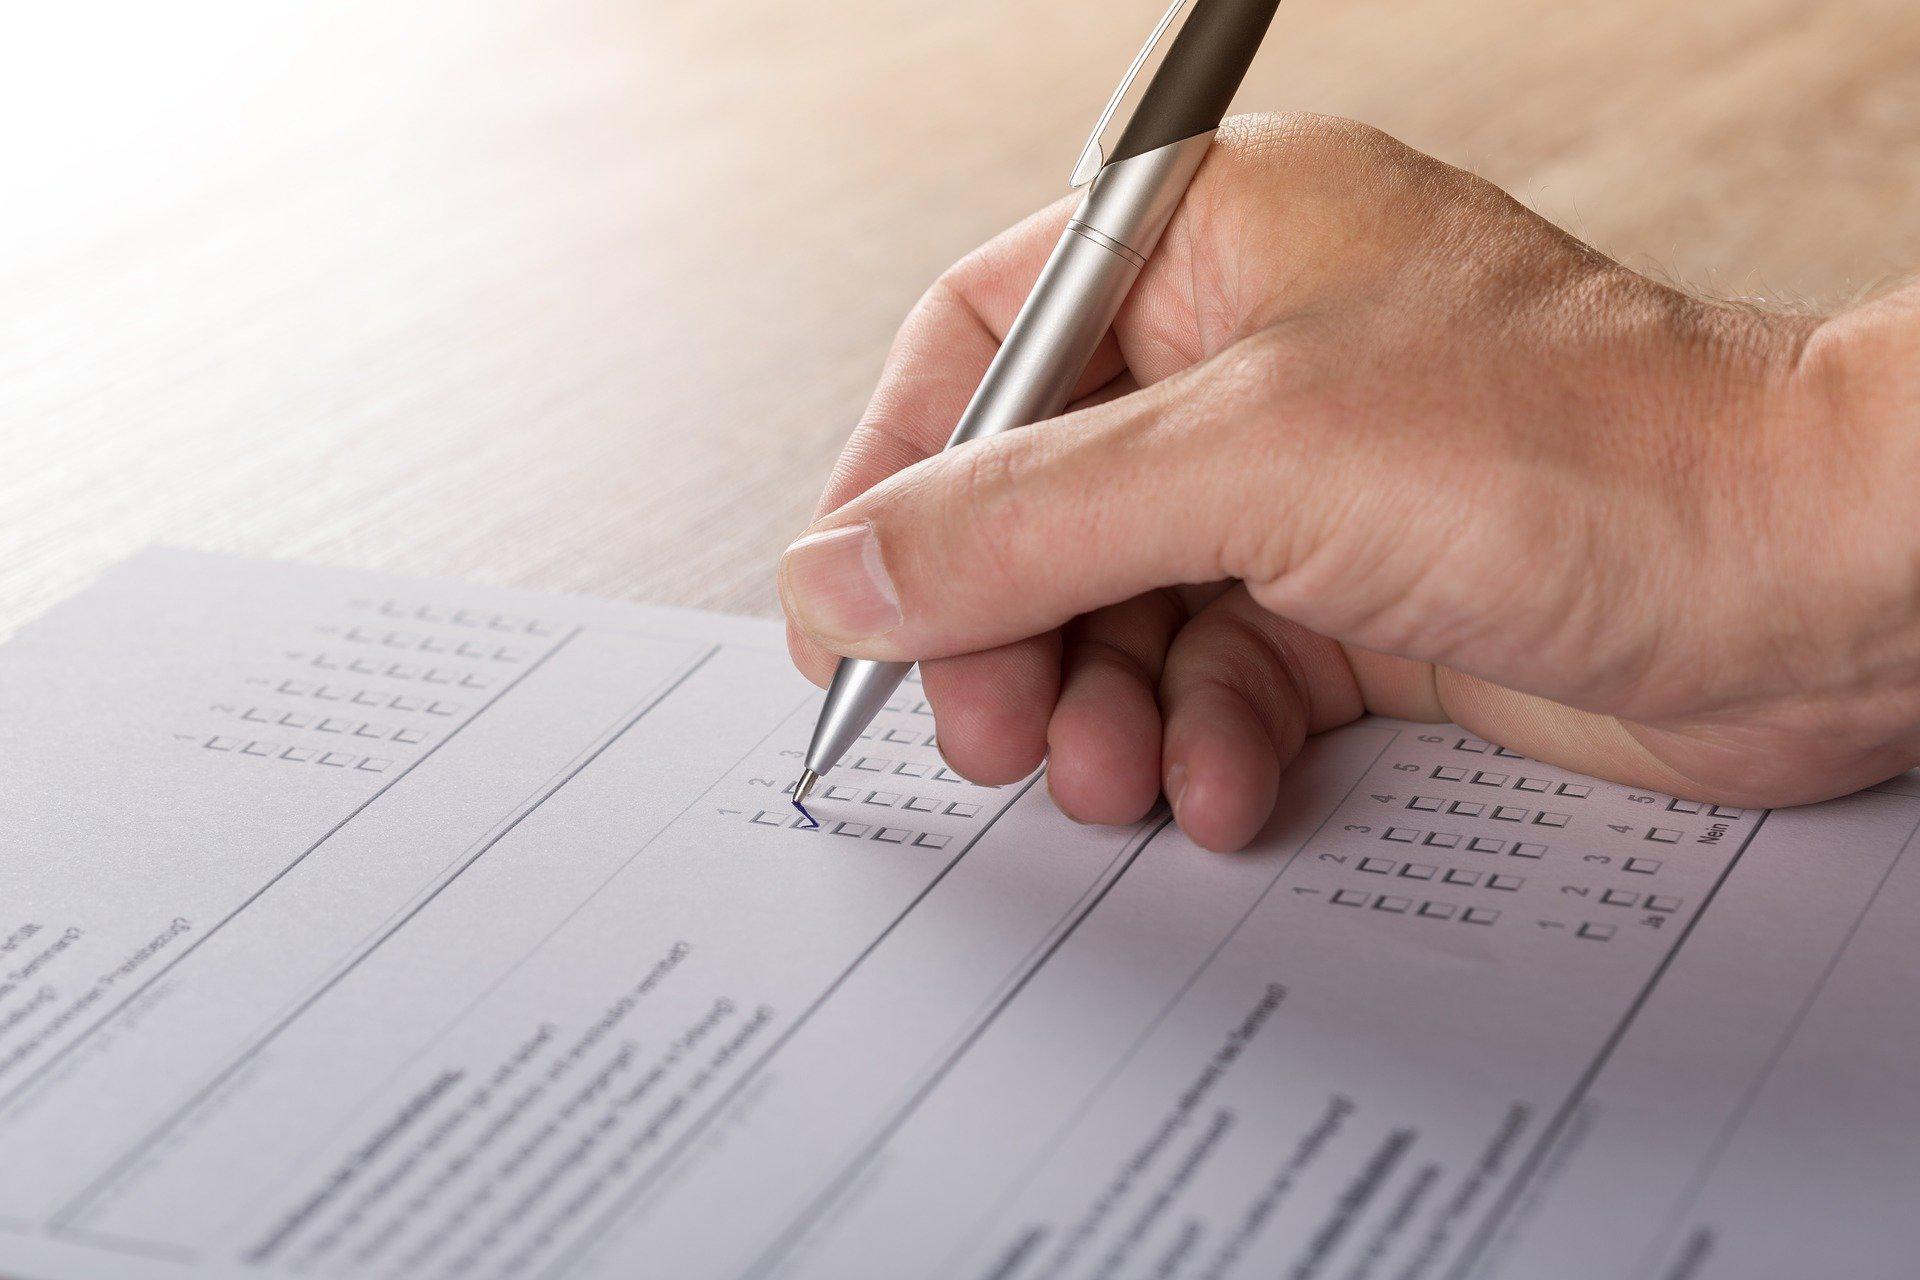 Панама опубликовала список юрисдикций, подлежащих отчетности по CRS